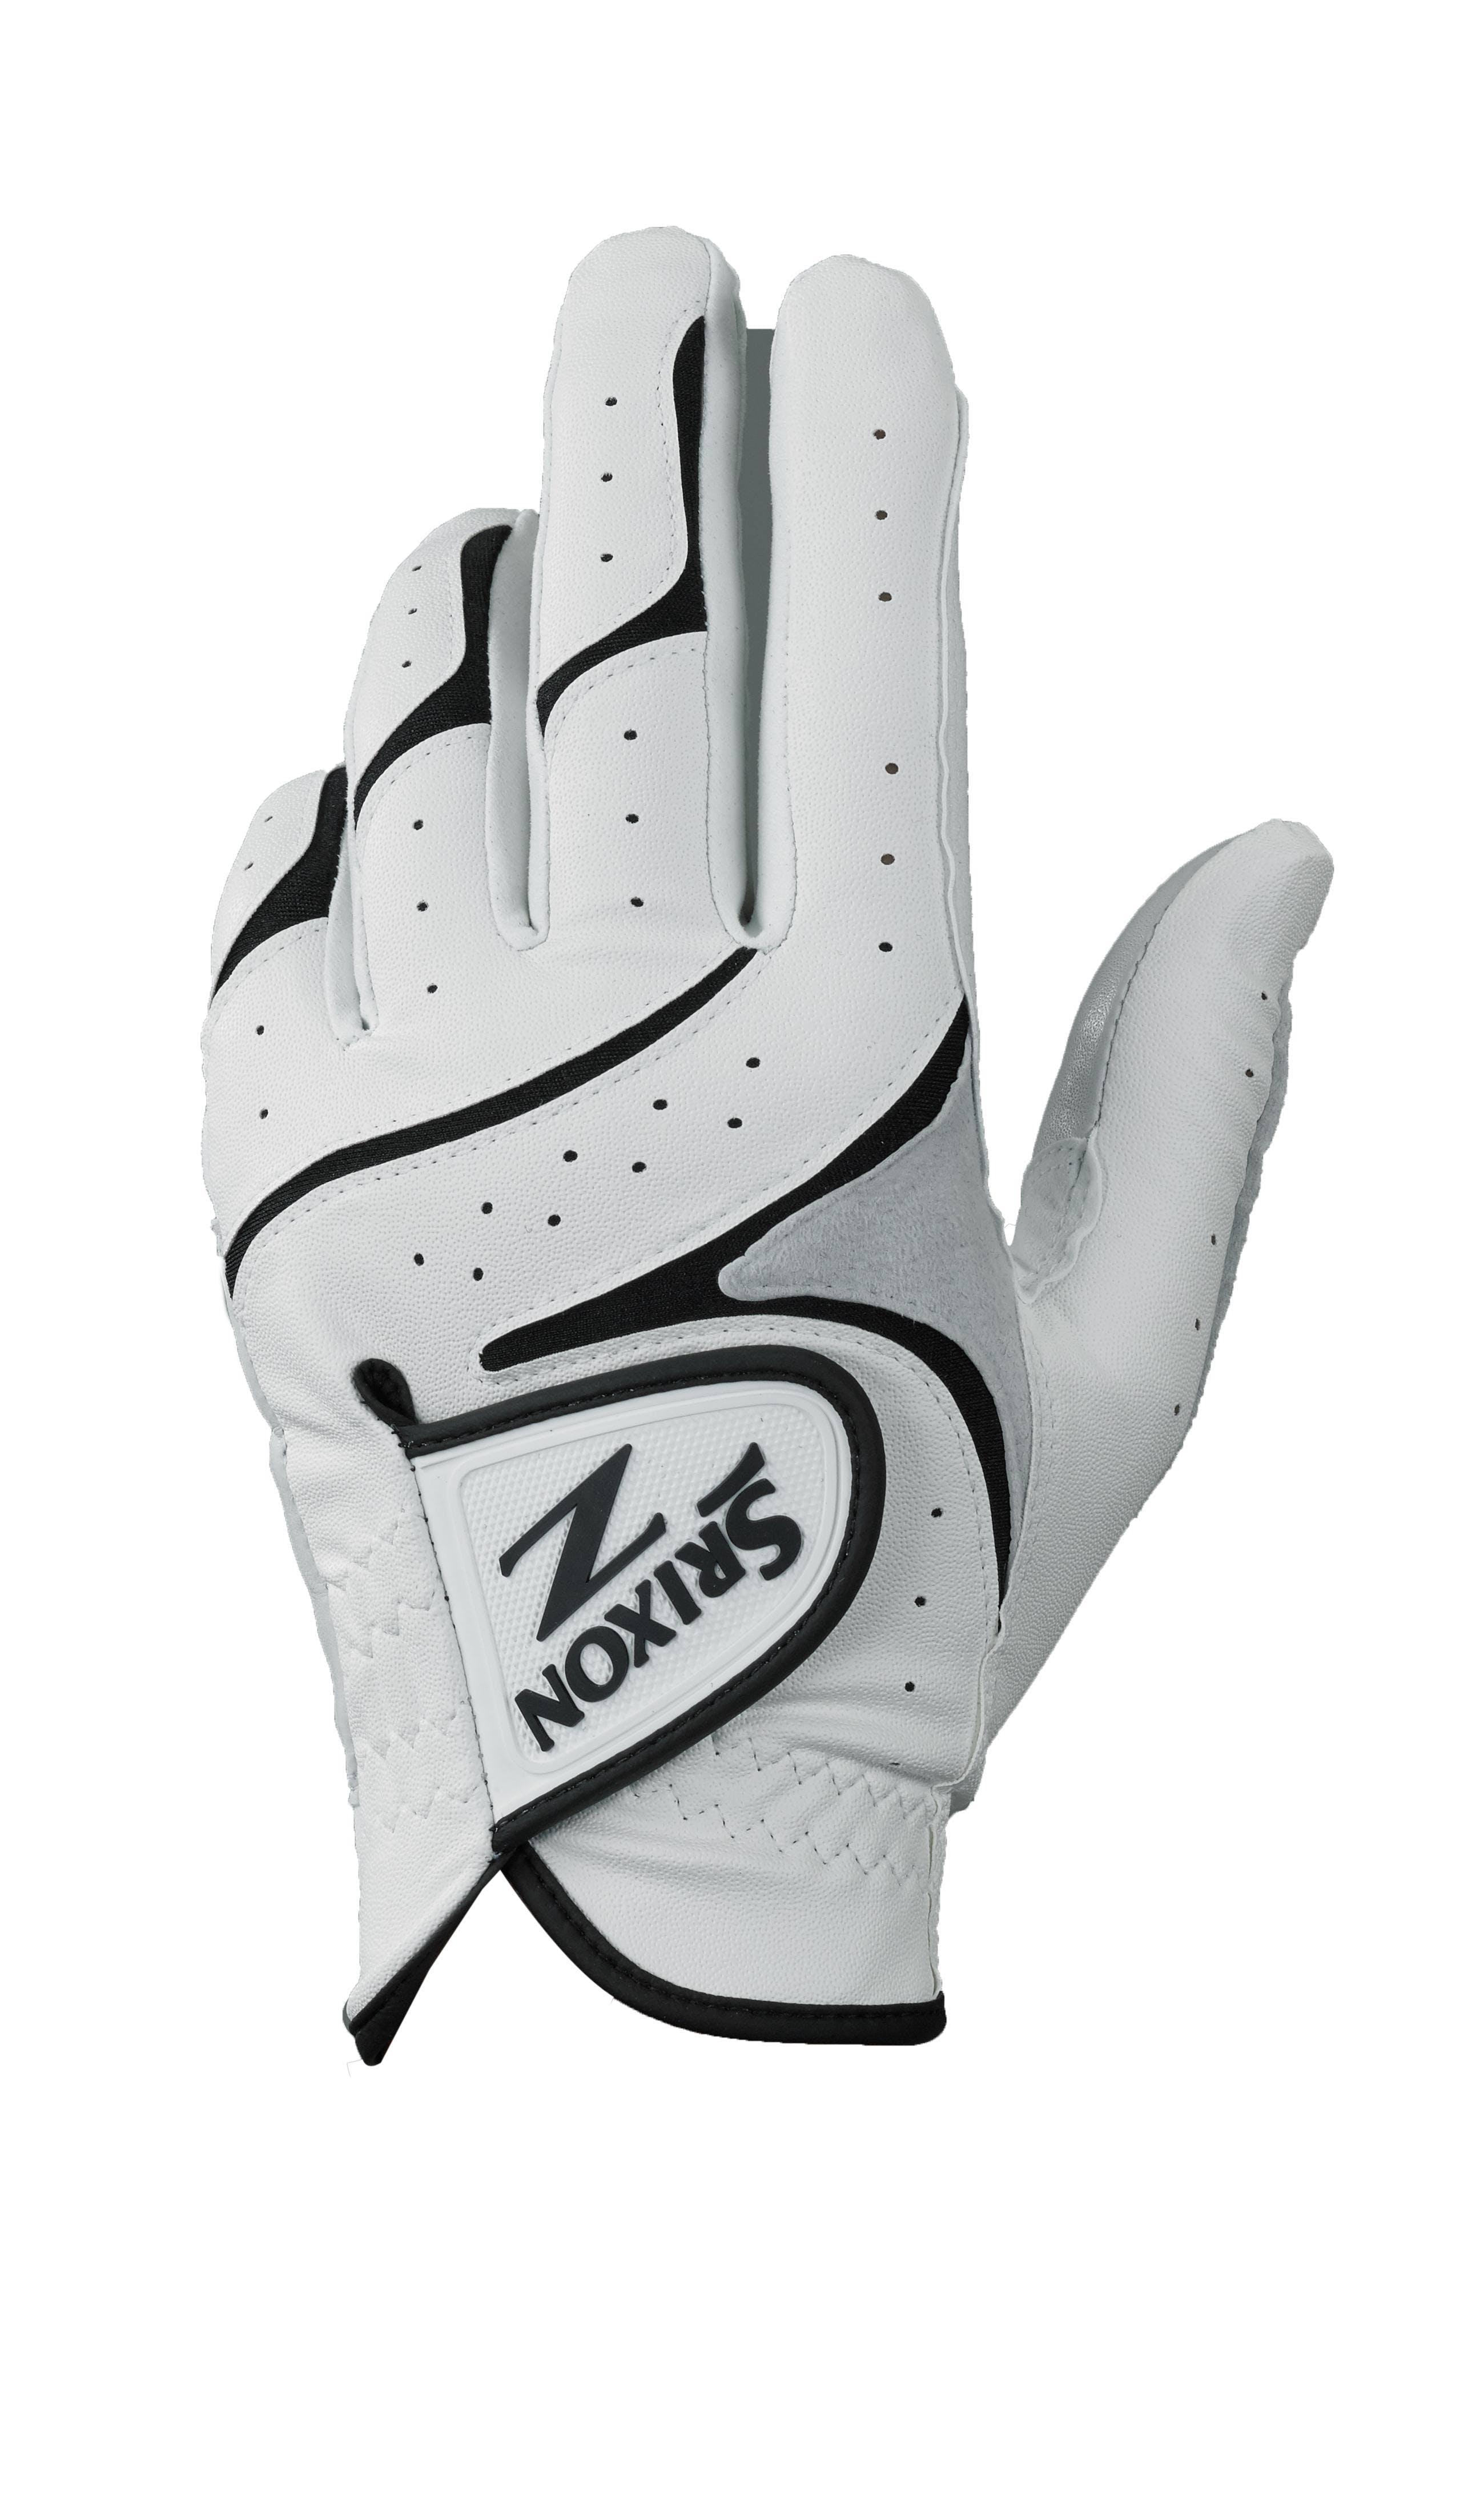 Srixon All Weather Golf Glove